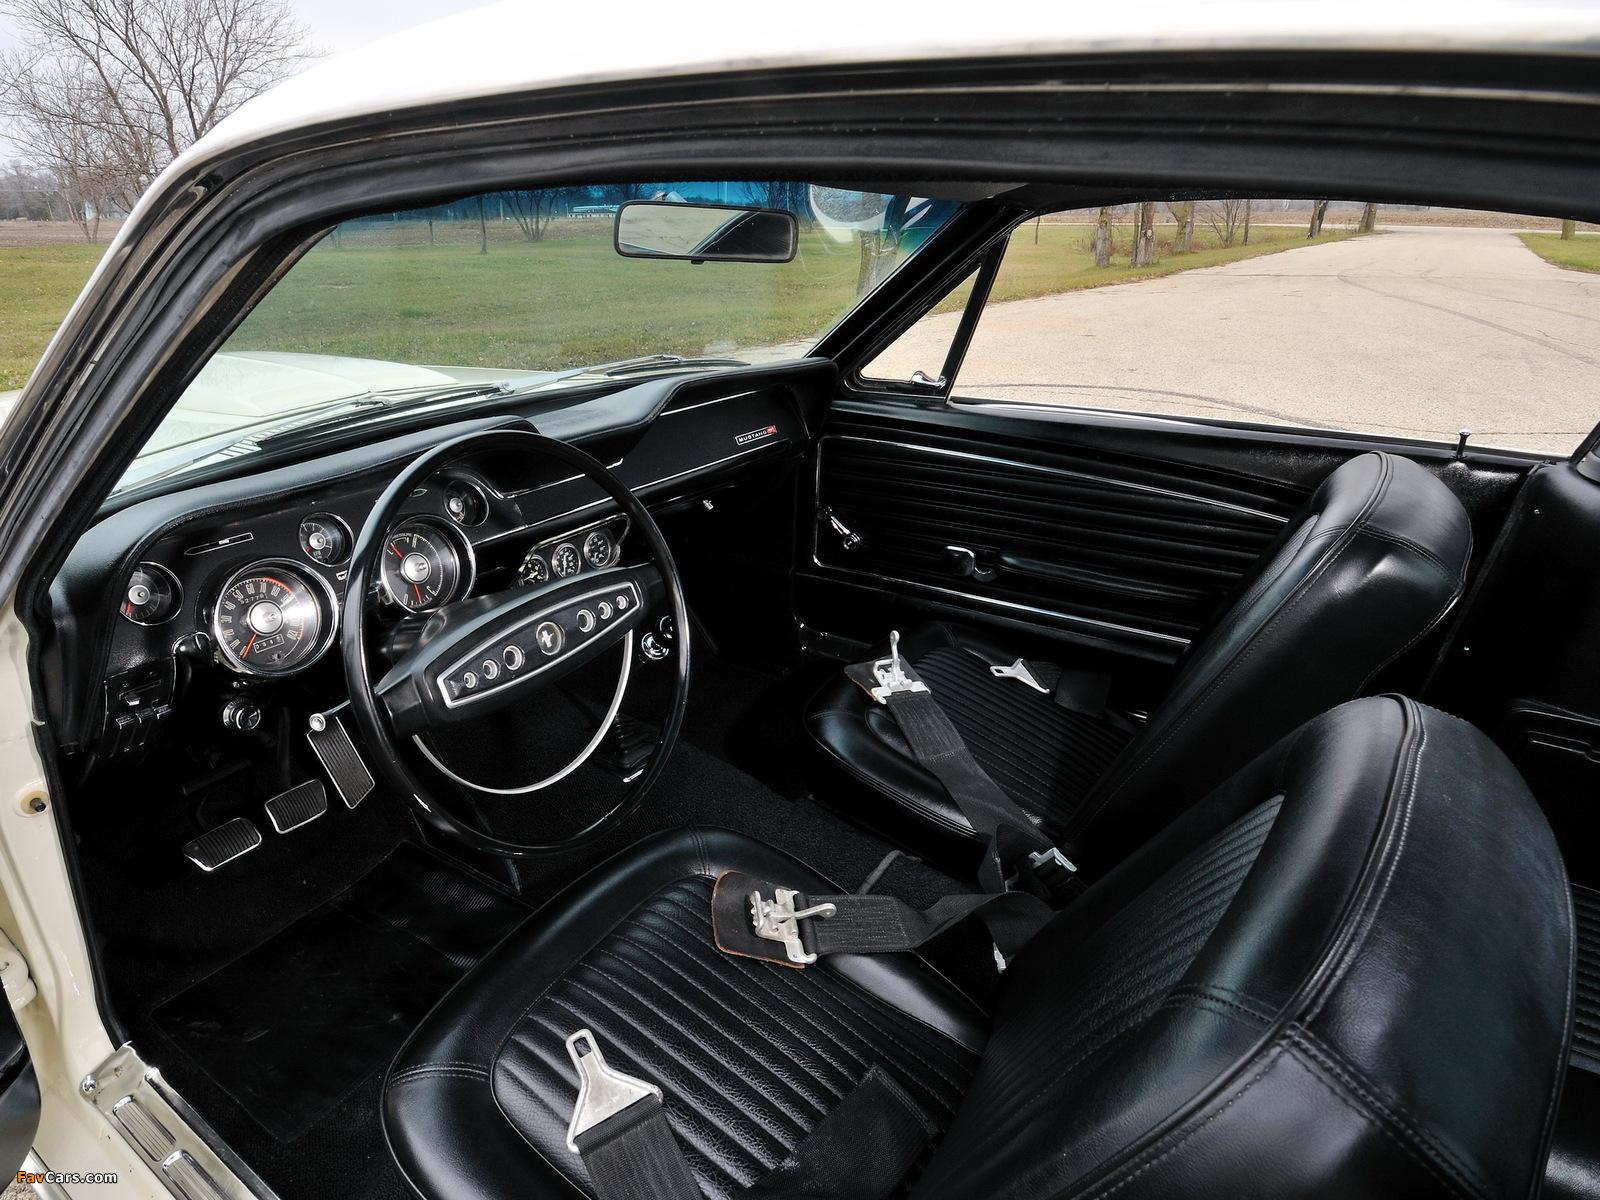 Mustang Lightweight 428/335 HP Tasca Car 1967 images (1600 x 1200)